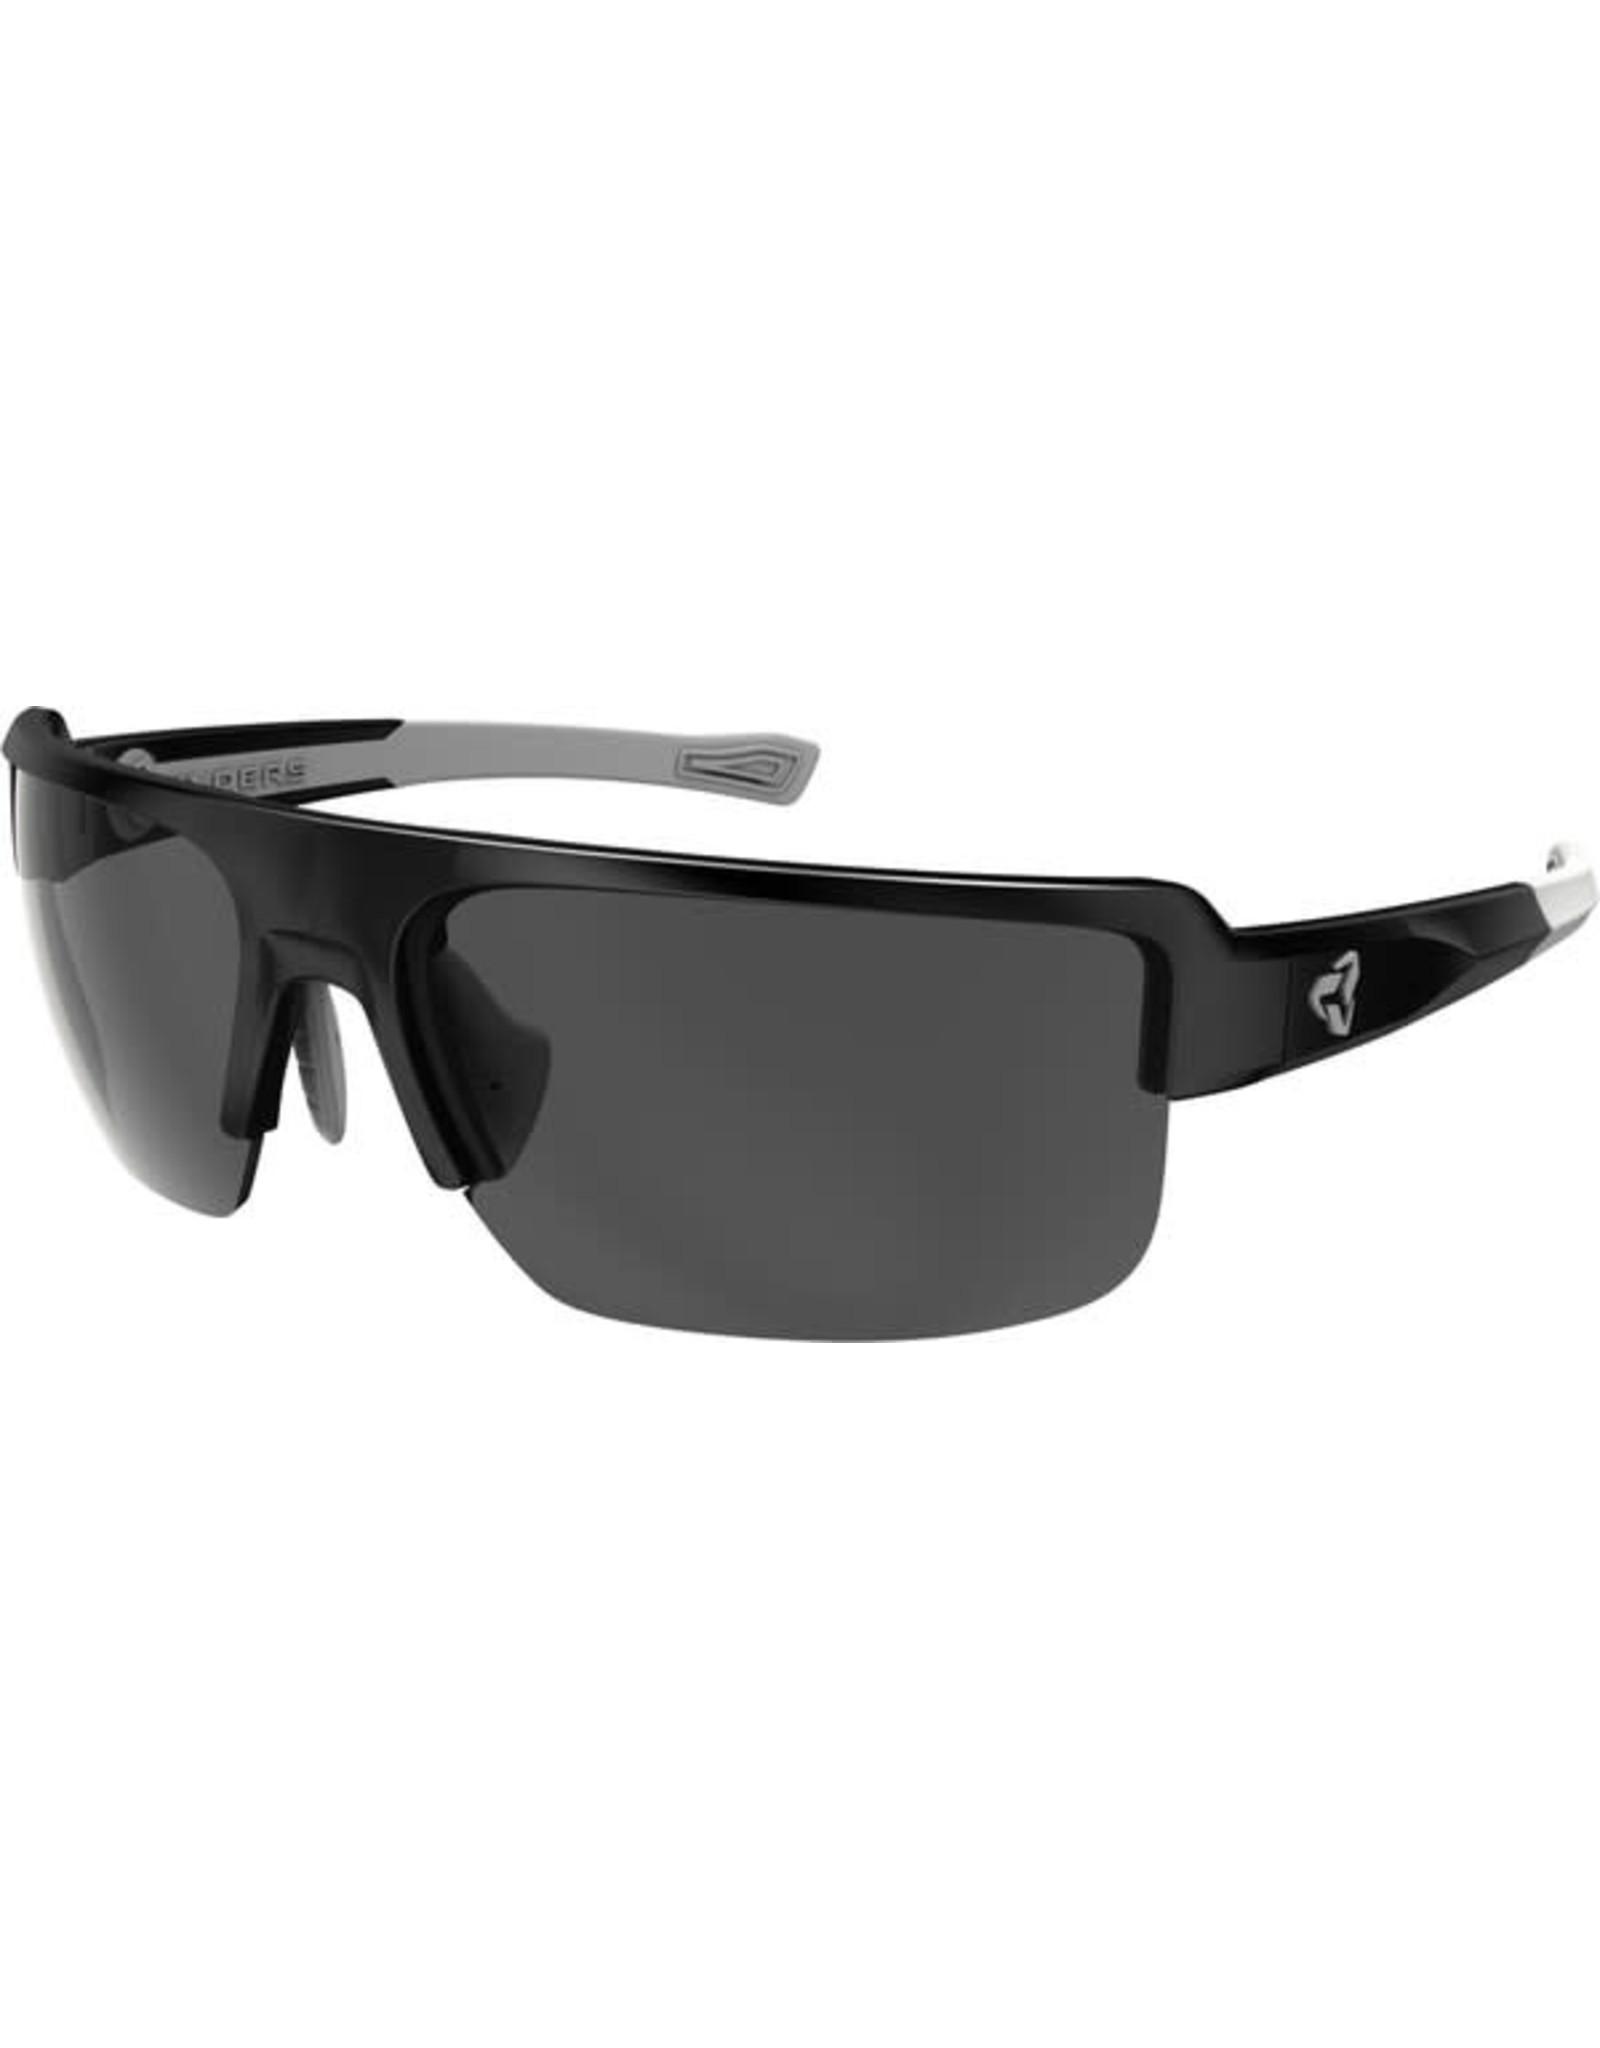 Ryders Eyewear Ryders Seventh Core Lens S19